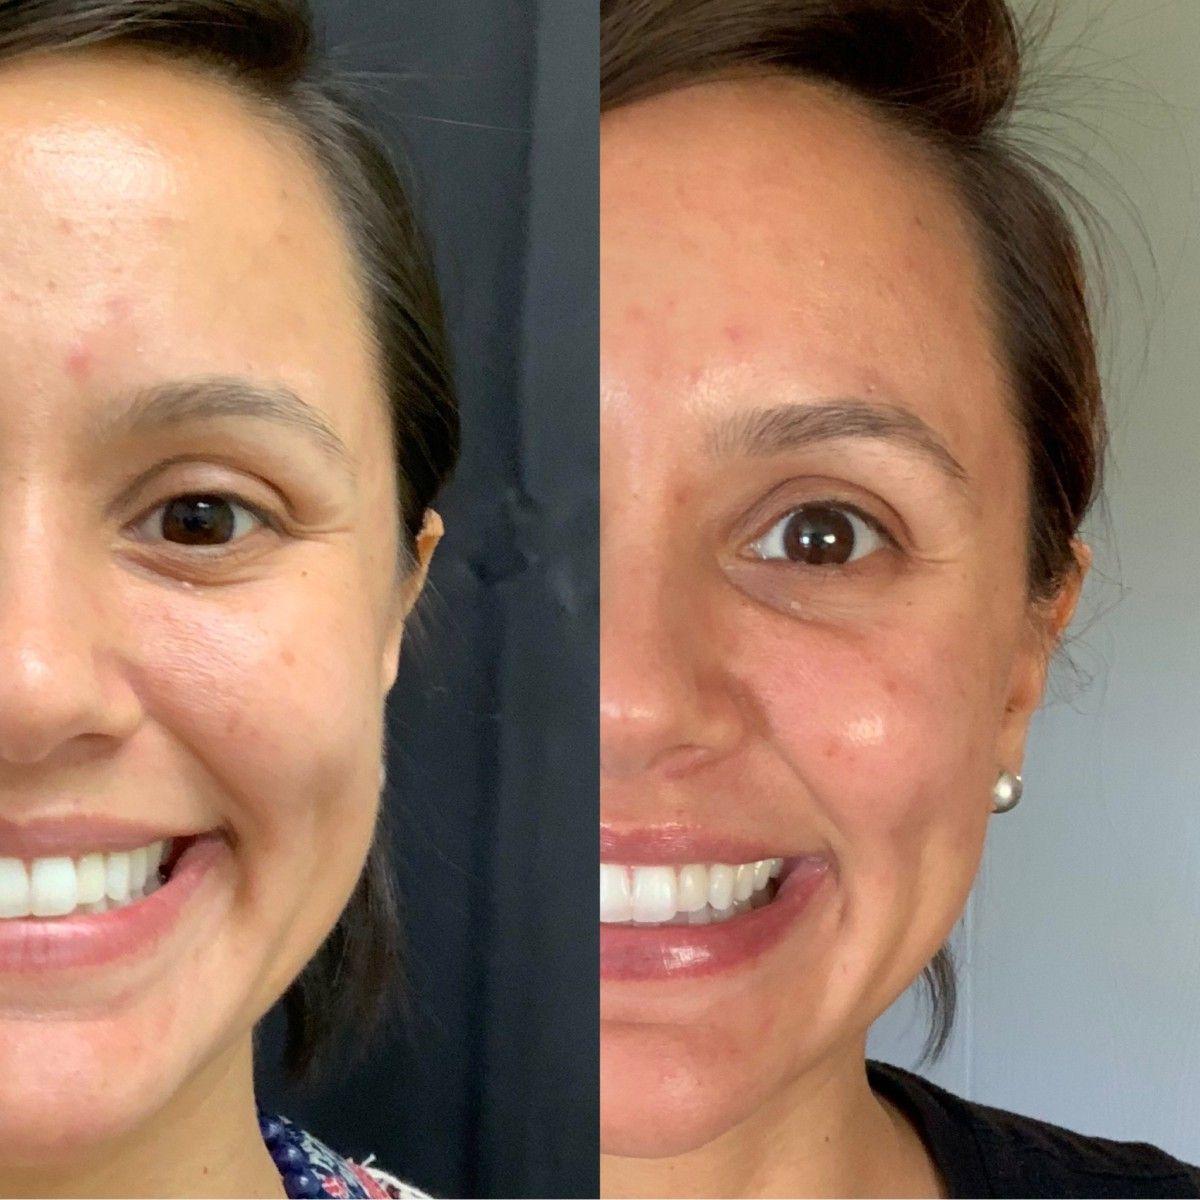 My Vampire Facial Aka Prp Facial Platelet Rich Plasma Vampire Facial Facial Facial Before And After